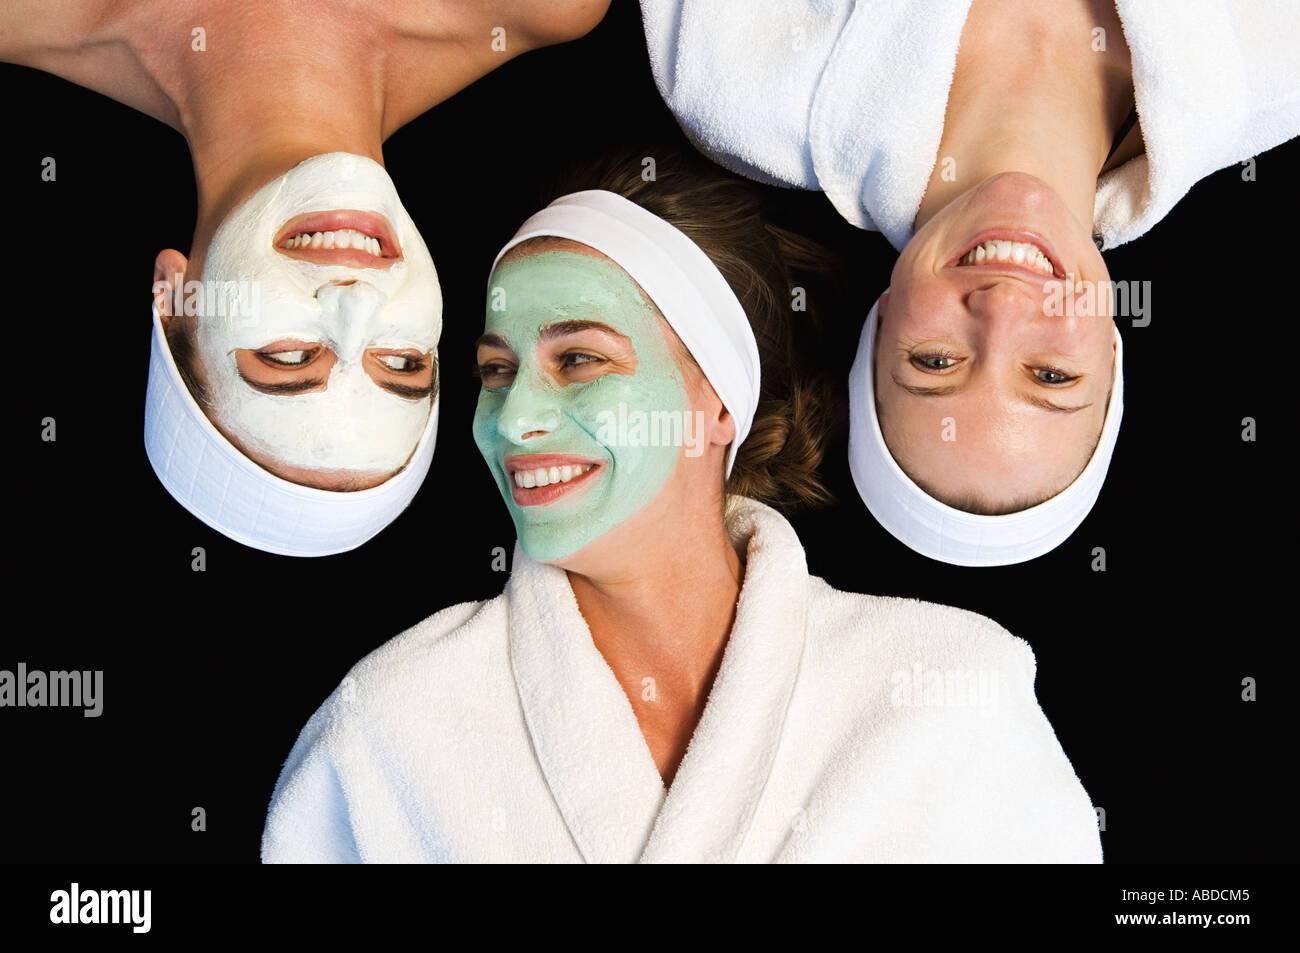 Friends wearing facial masks - Stock Image